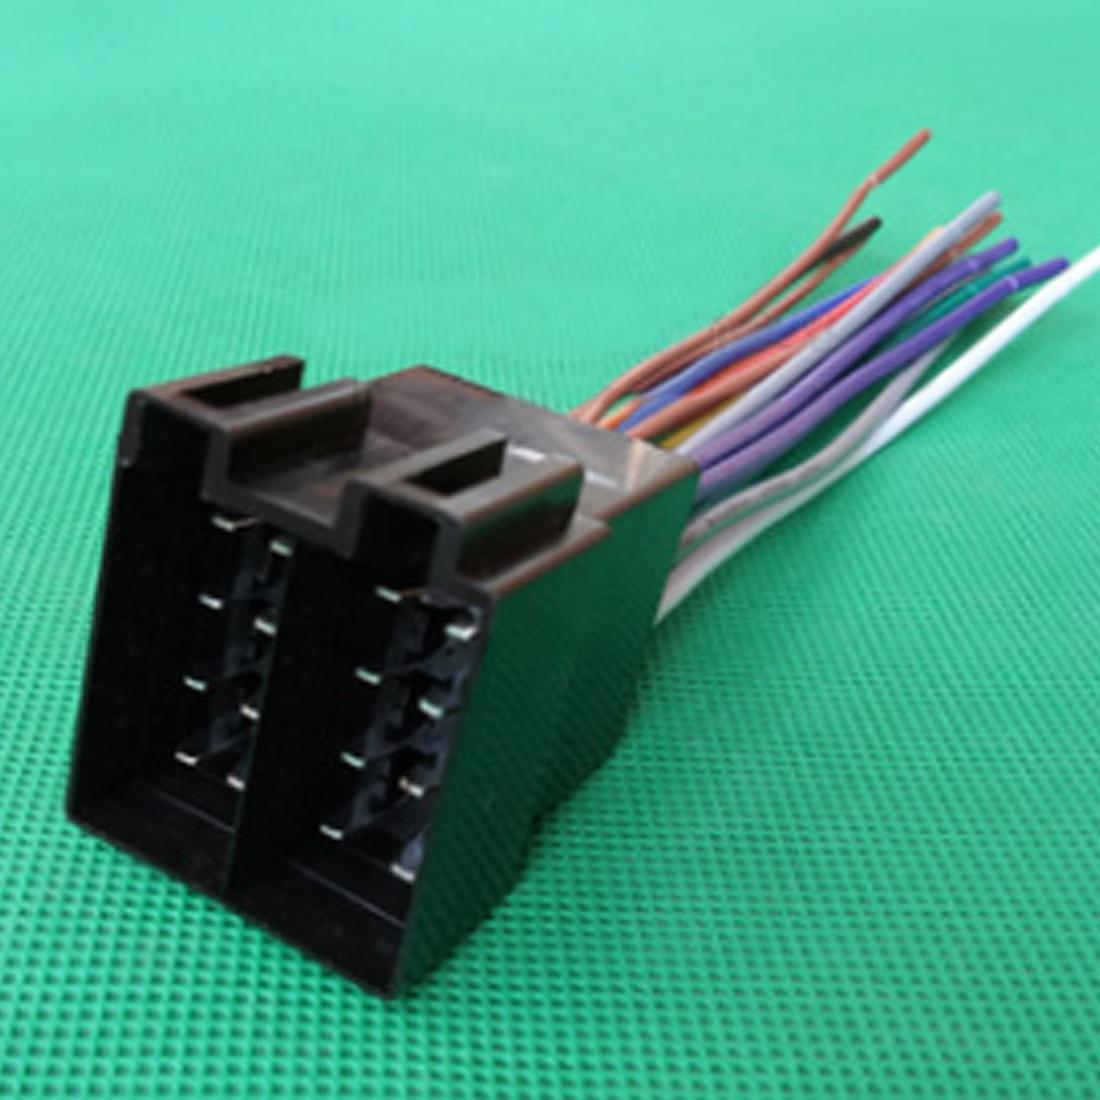 small resolution of dewtreetali universal female iso radio wire wiring harness adapter connector car adaptor plug for vw citroen audi passat jetta wholesale radio wires iso